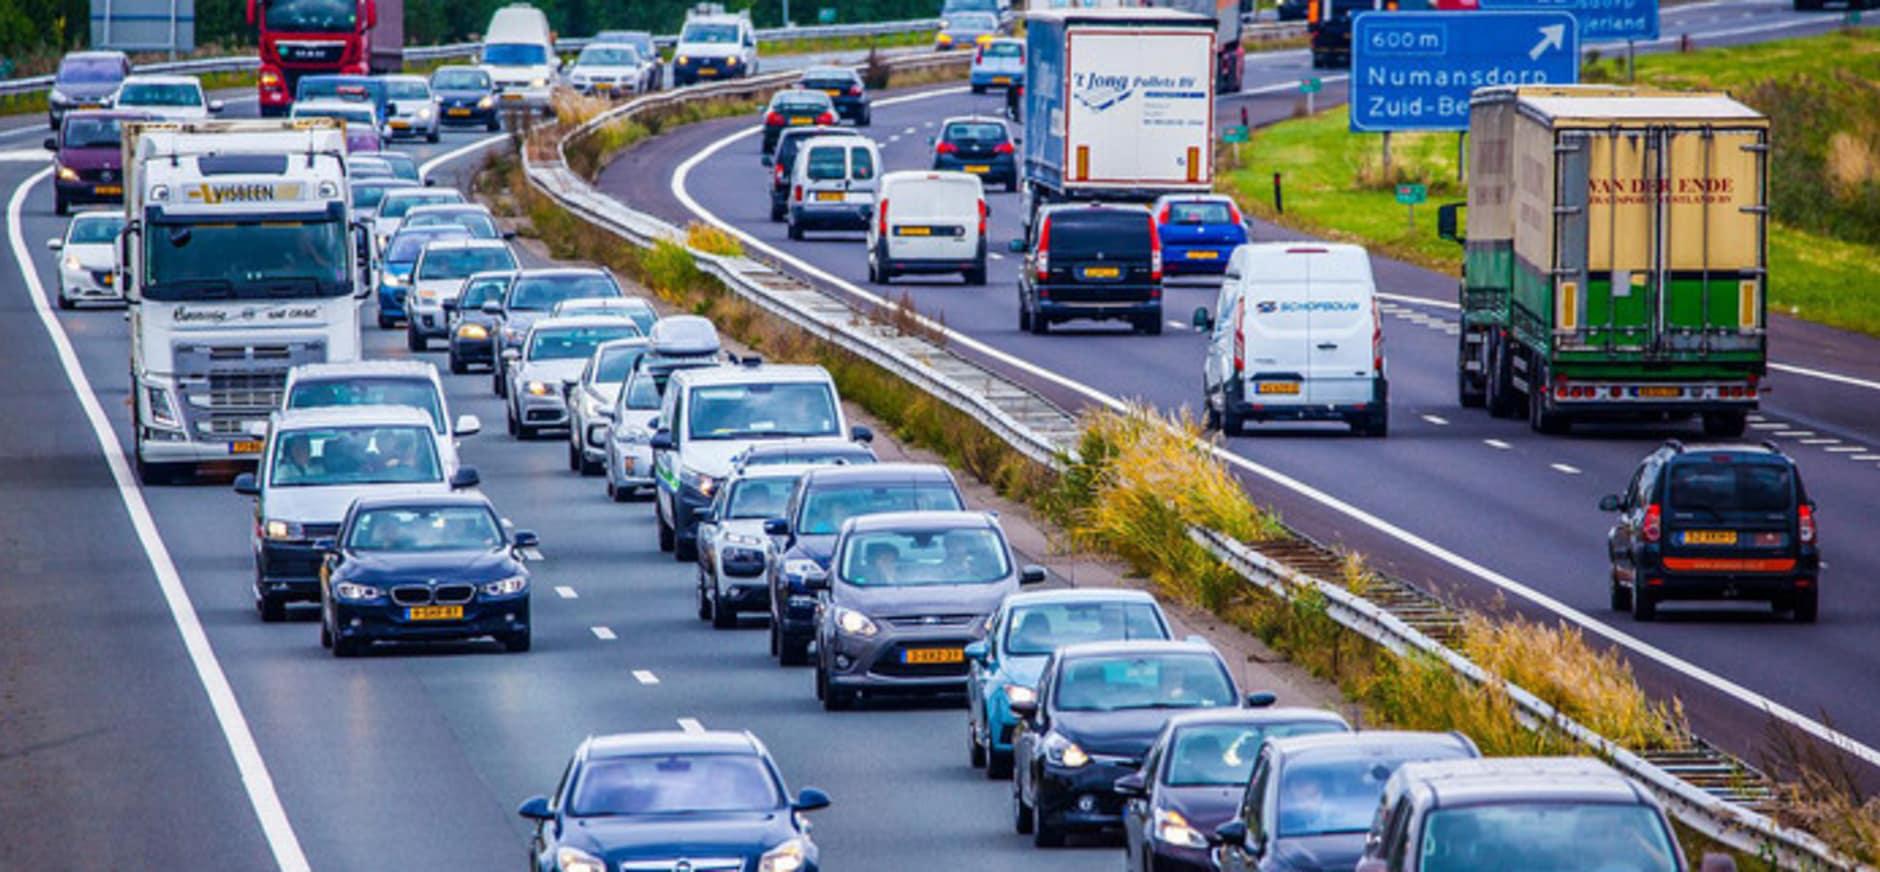 Drukte op de A29 Rotterdam richting Numansdorp